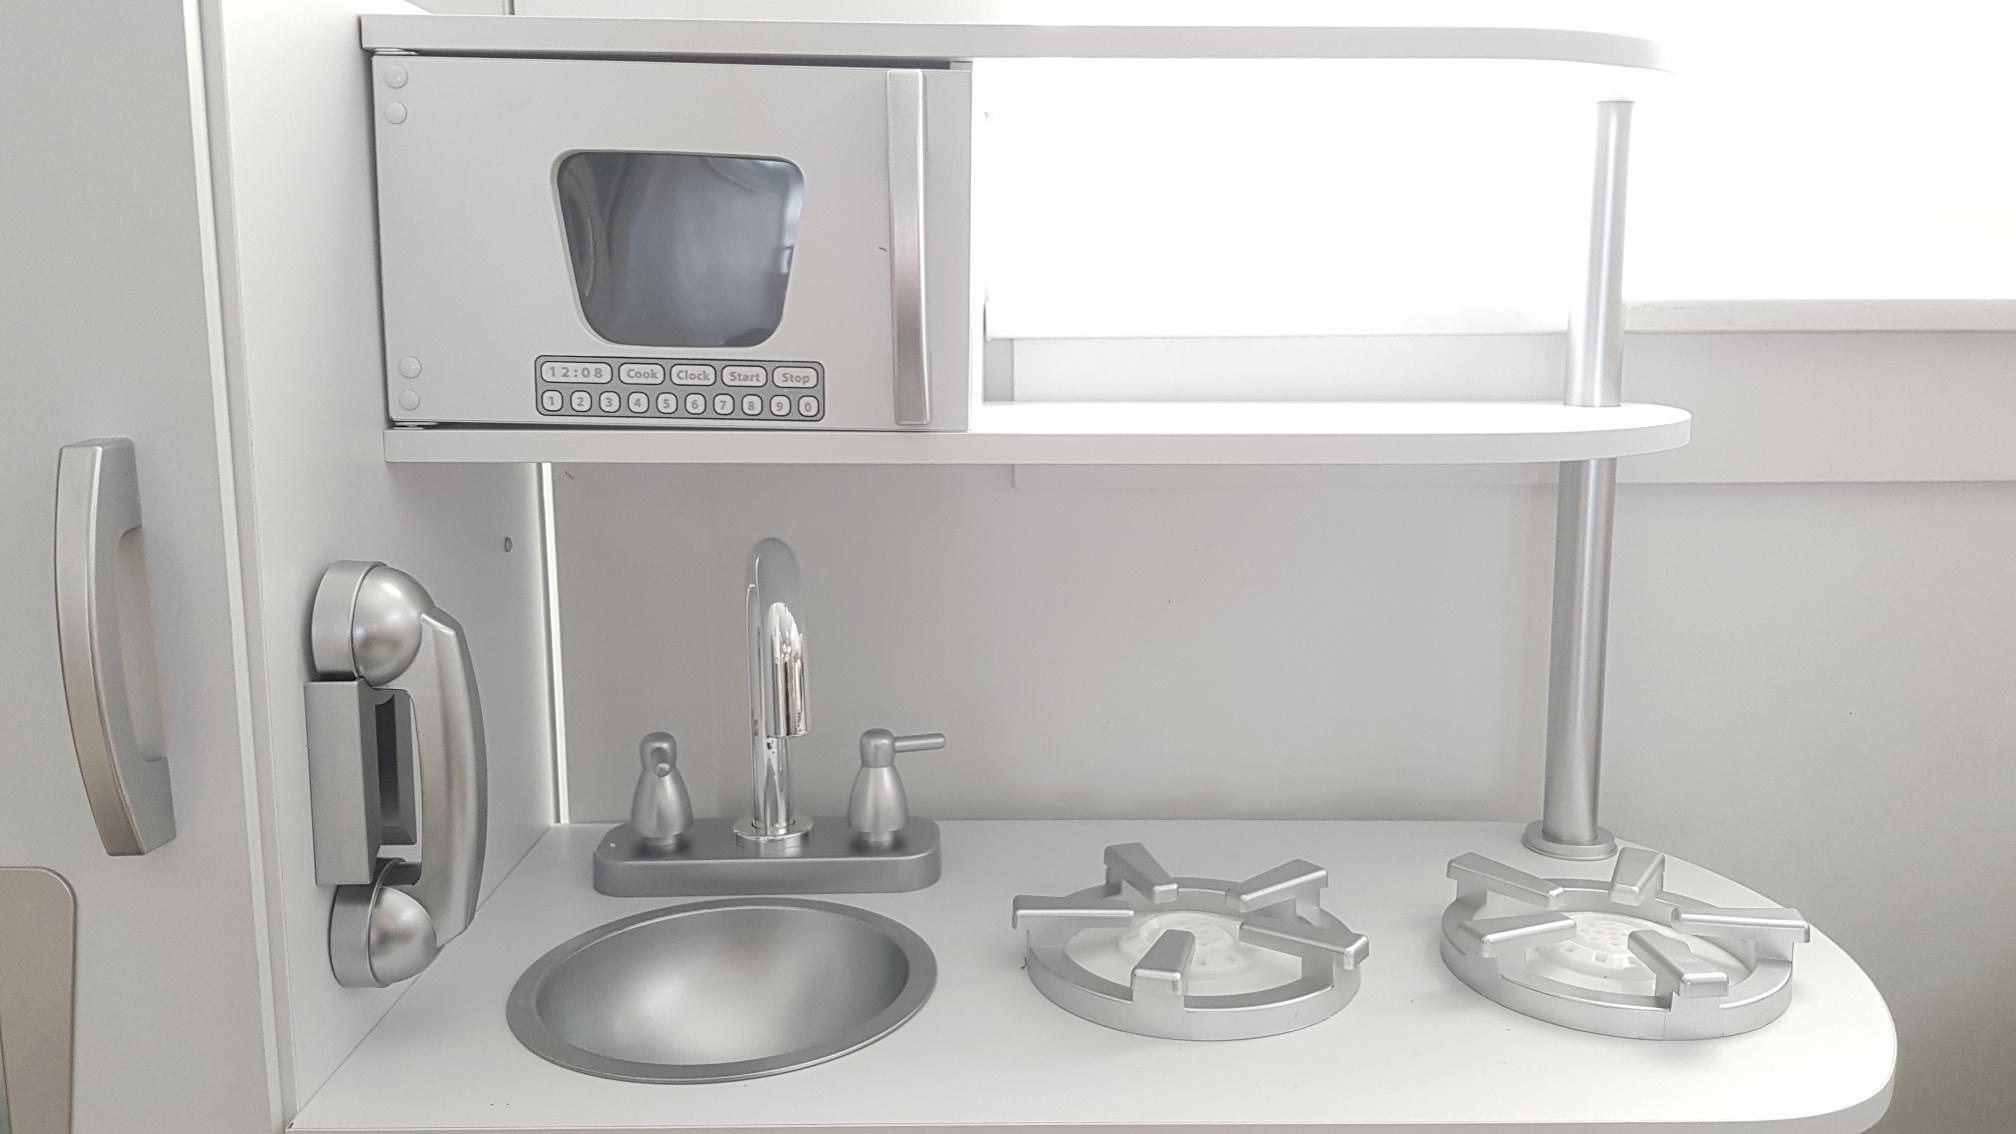 cuisine-jouet rétro de KidKraft